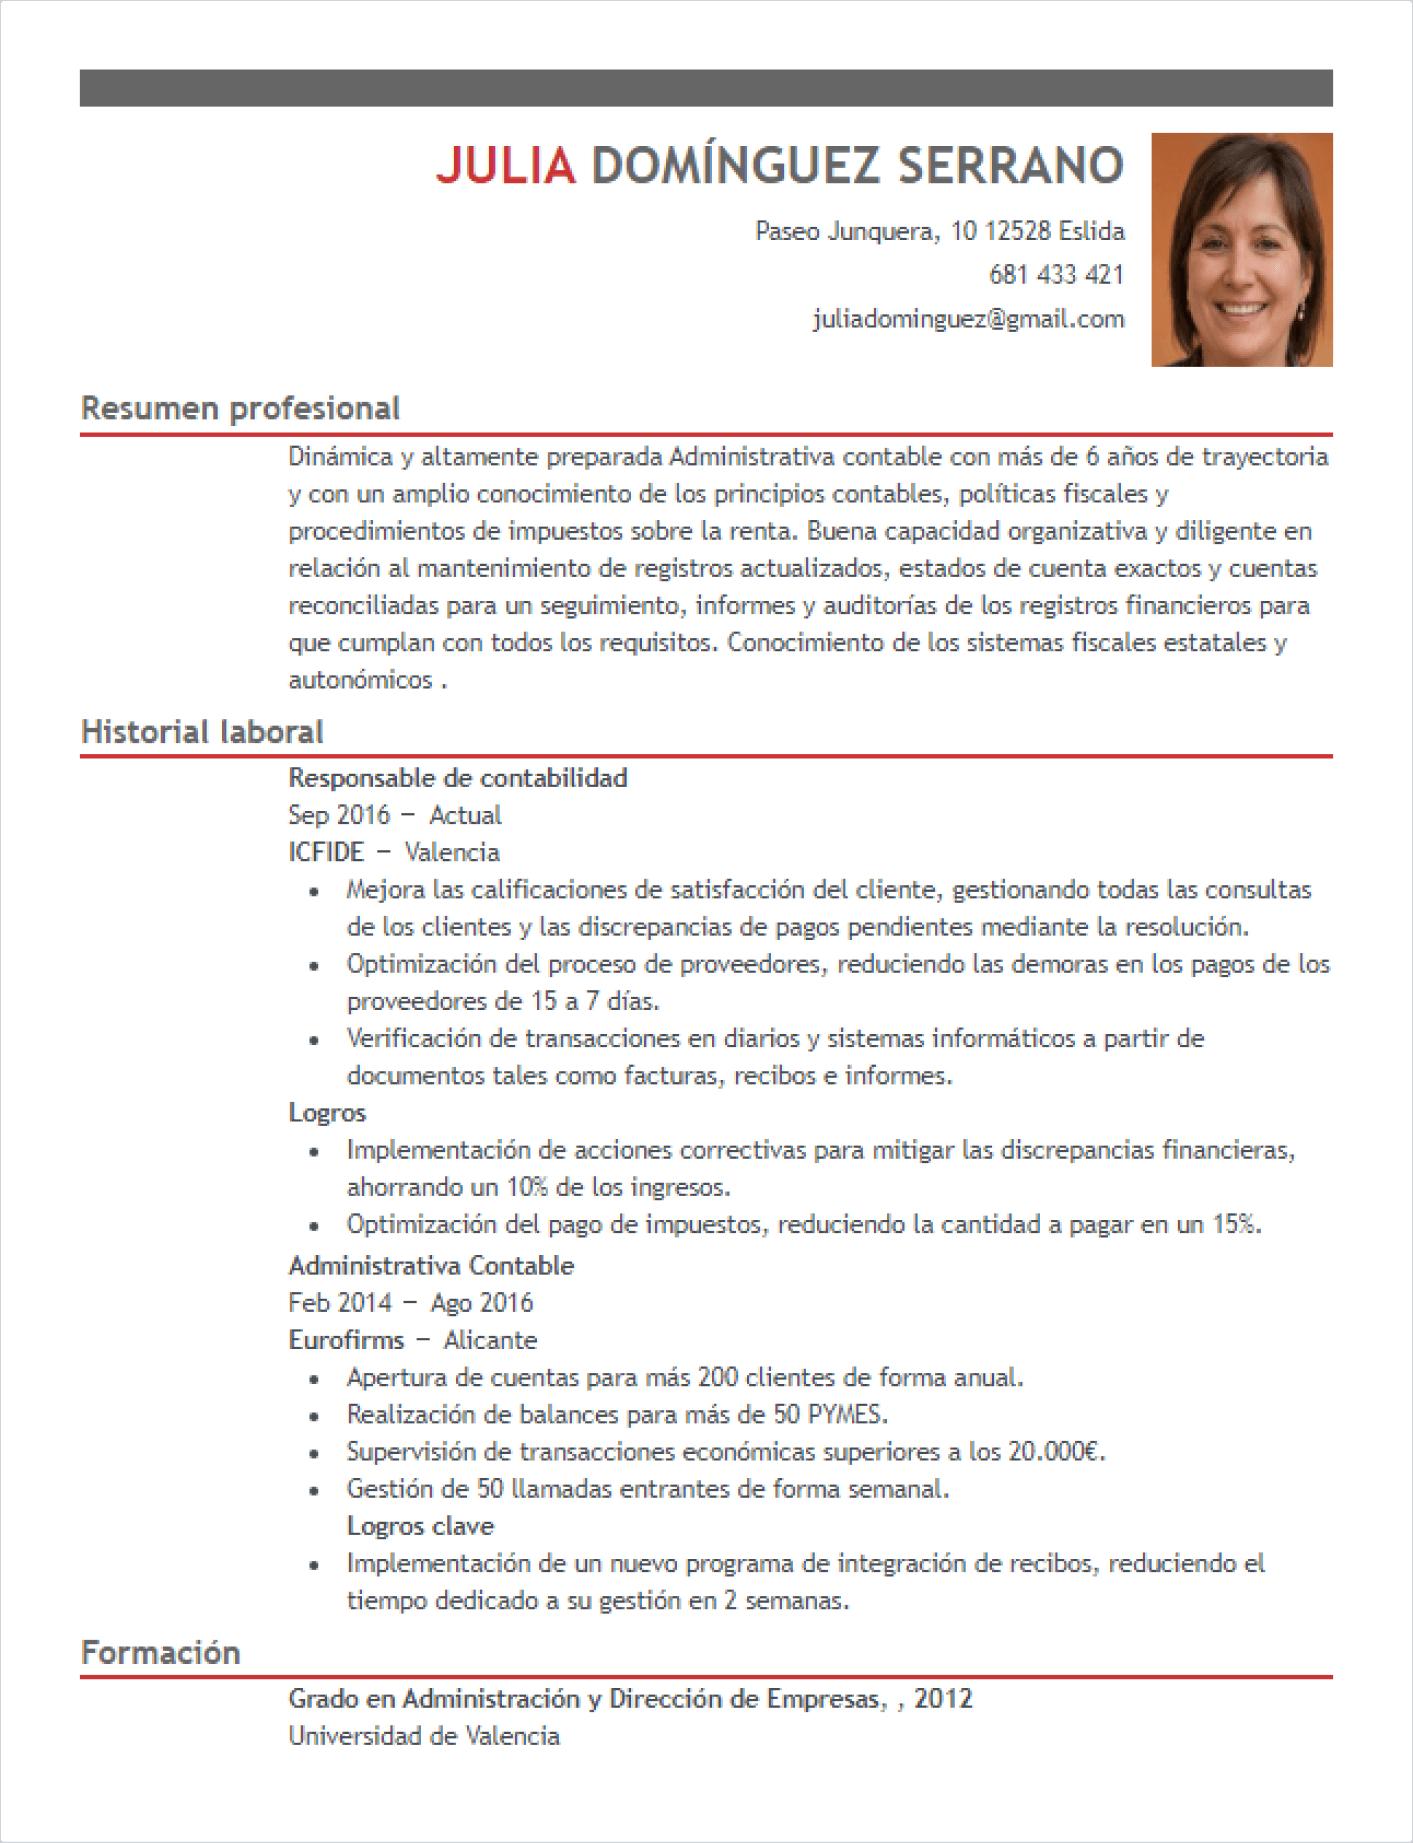 CV-Sample